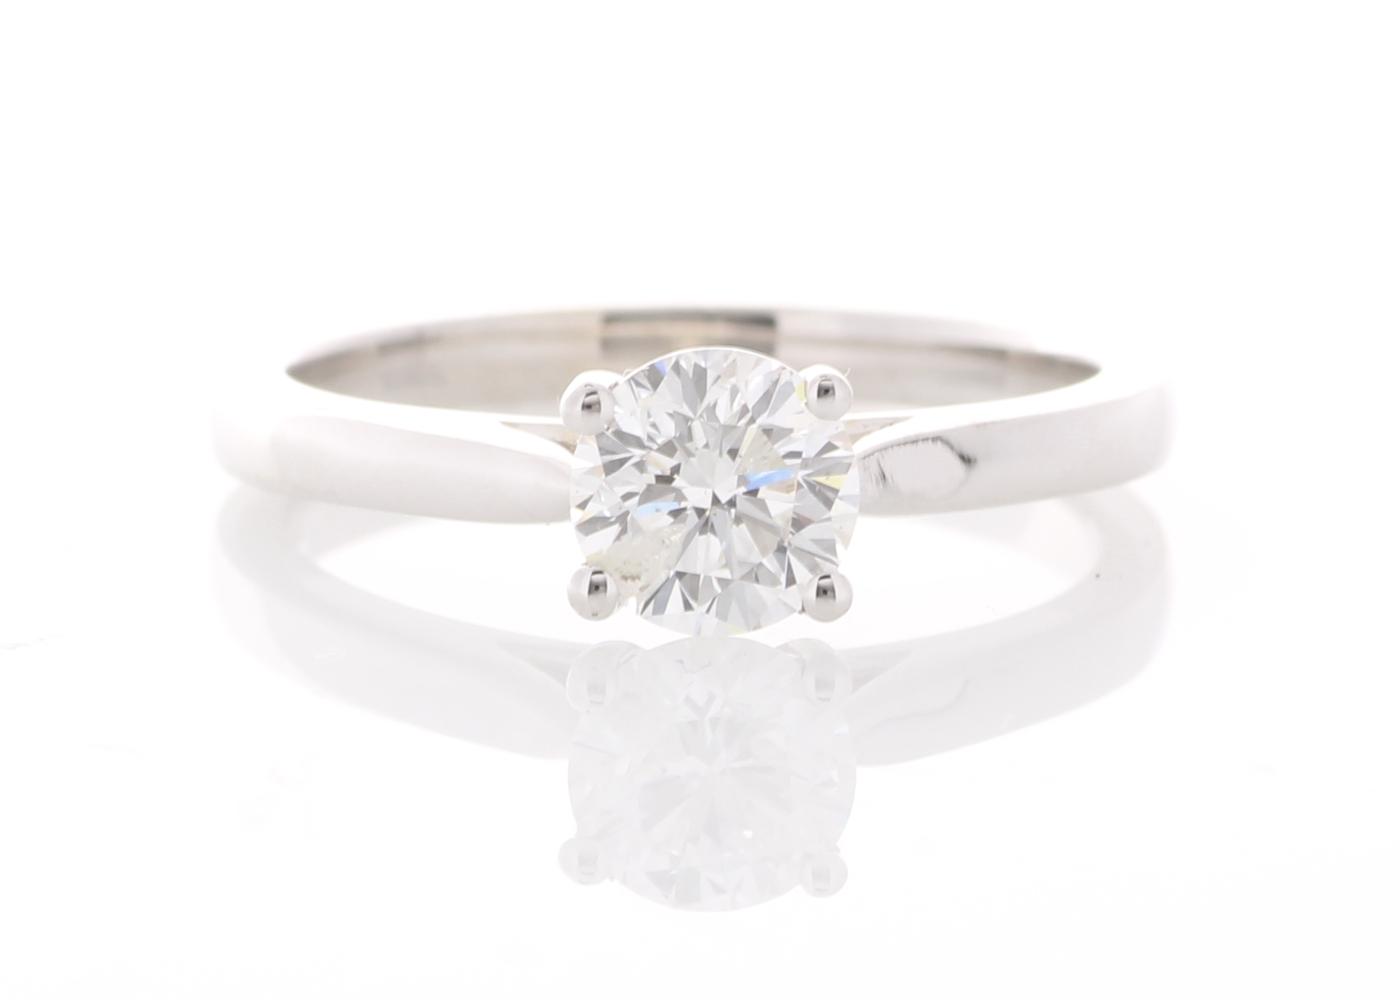 18ct White Gold Single Stone Prong Set Diamond Ring 0.73 Carats